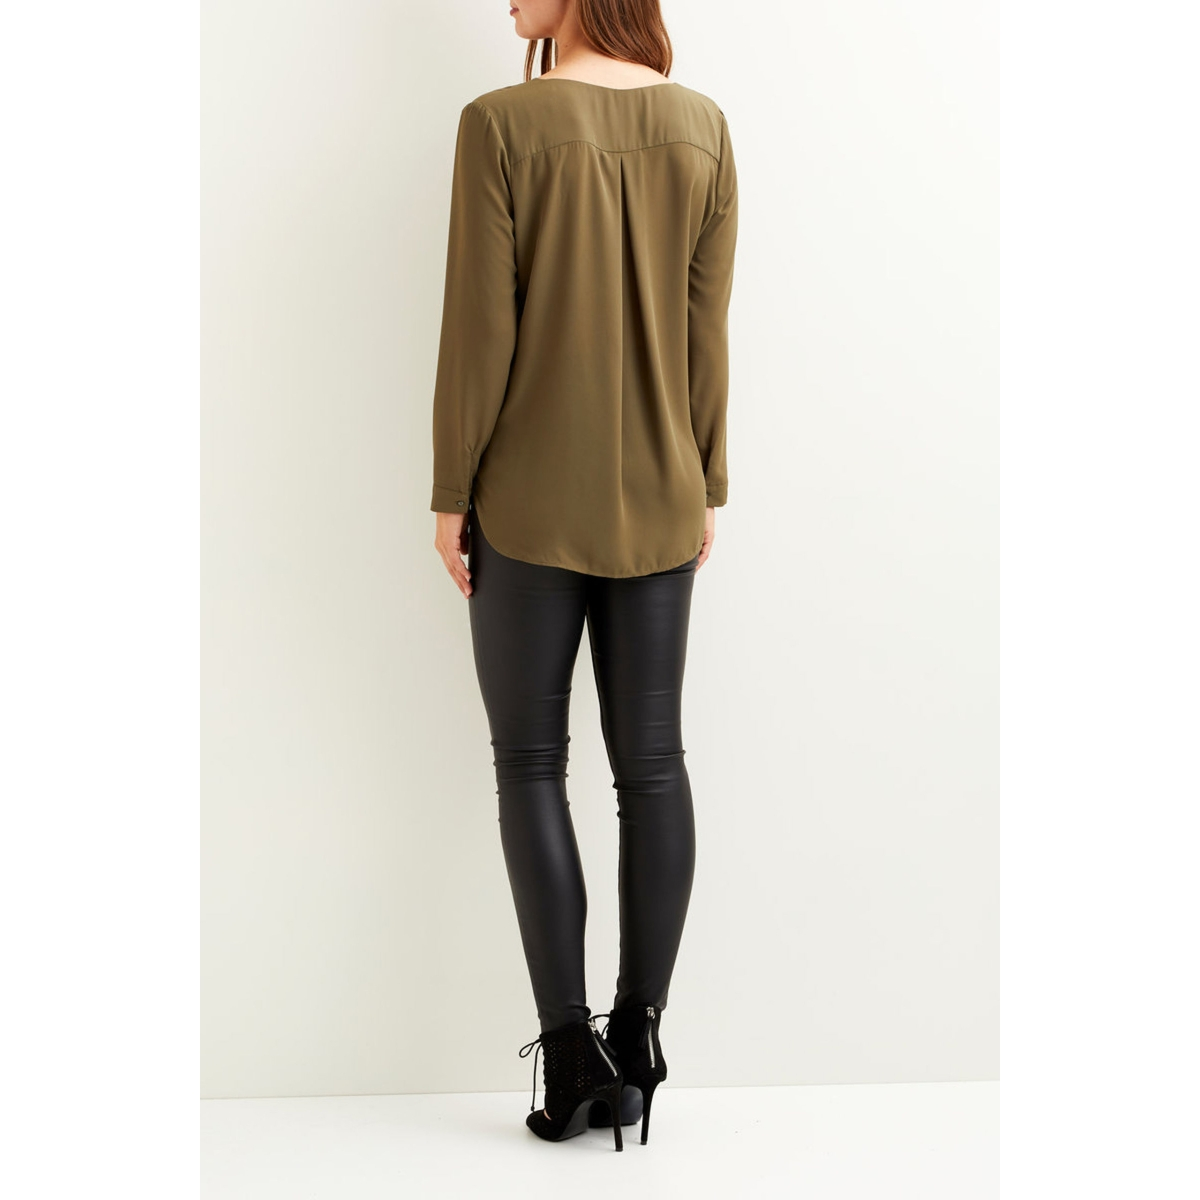 vilucy l/s shirt - noos 14044253 vila blouse ivy green